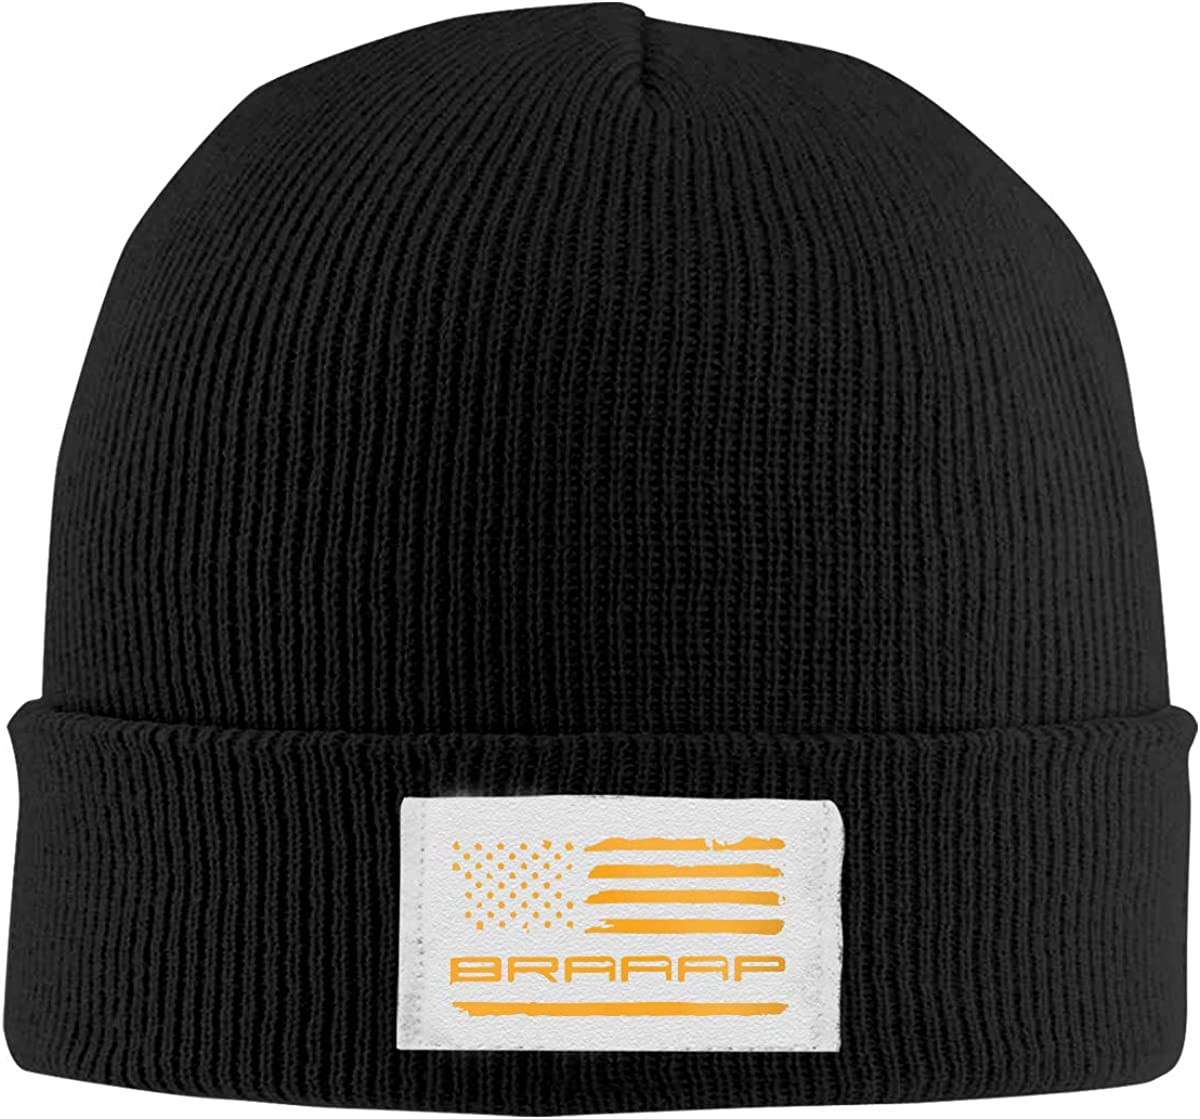 Braaap Motocross Dirt Bike American Flag Top Level Beanie Men Women Unisex Stylish Slouch Beanie Hats Black